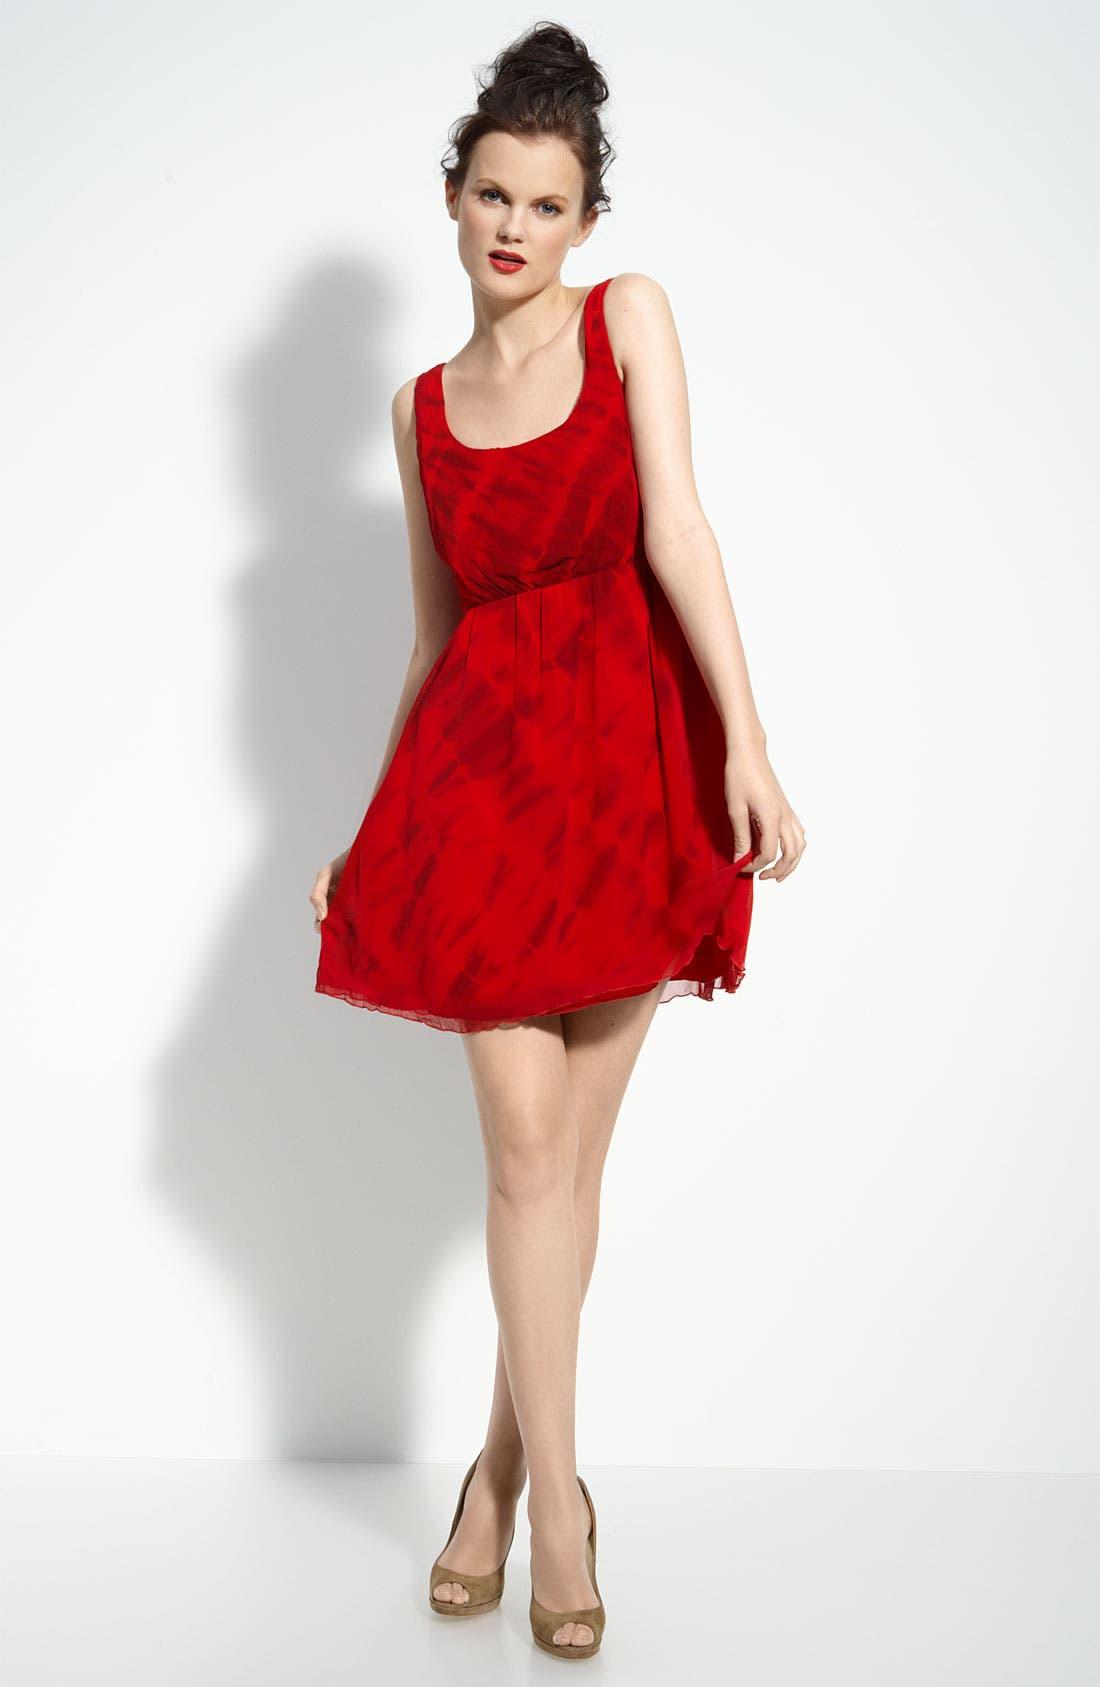 Alternate Image 1 Selected - Alice + Olivia 'Cabella' Tie Dye Tank Dress